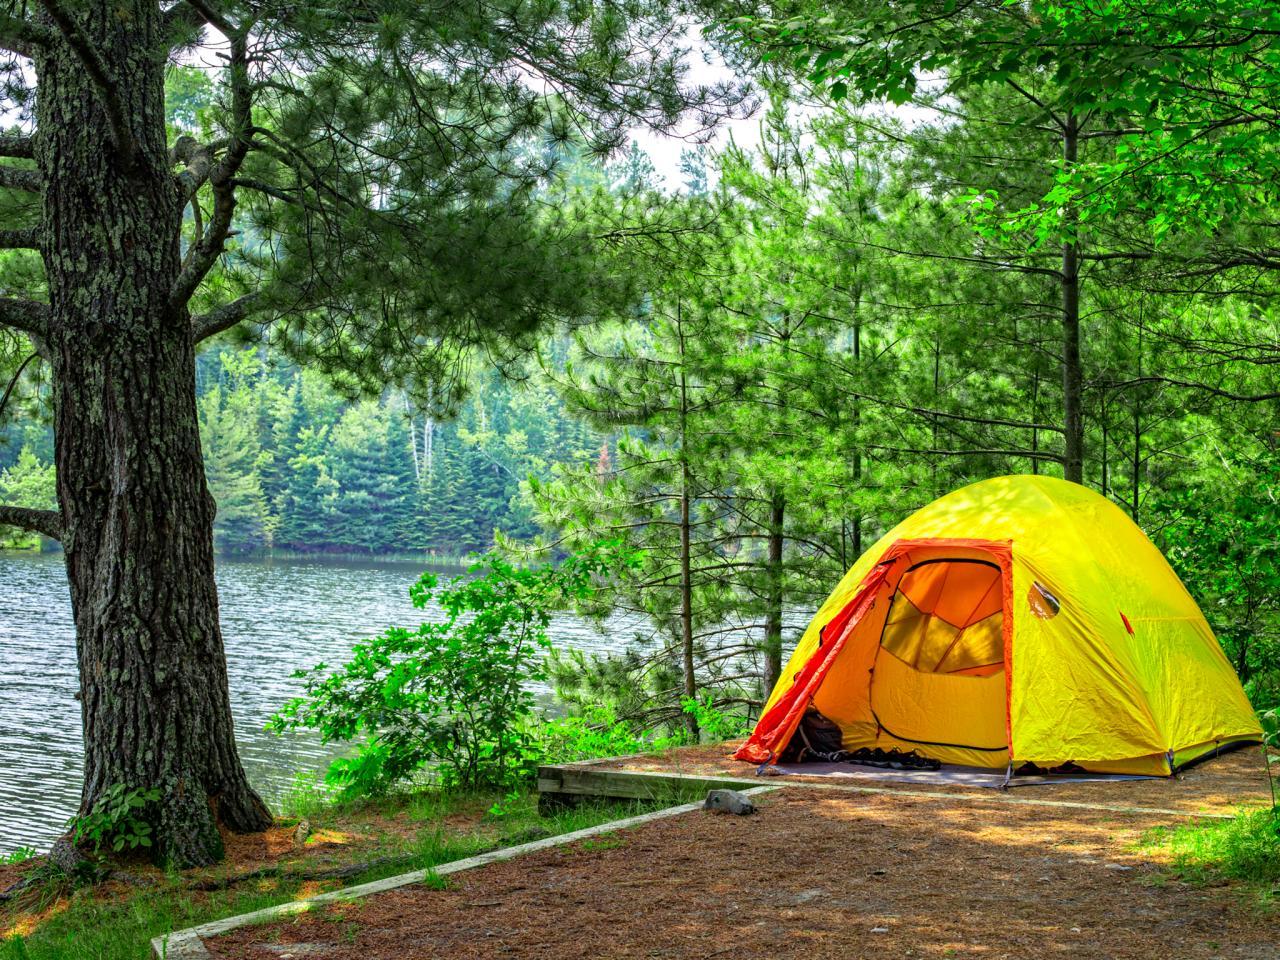 camping gear tent near lake